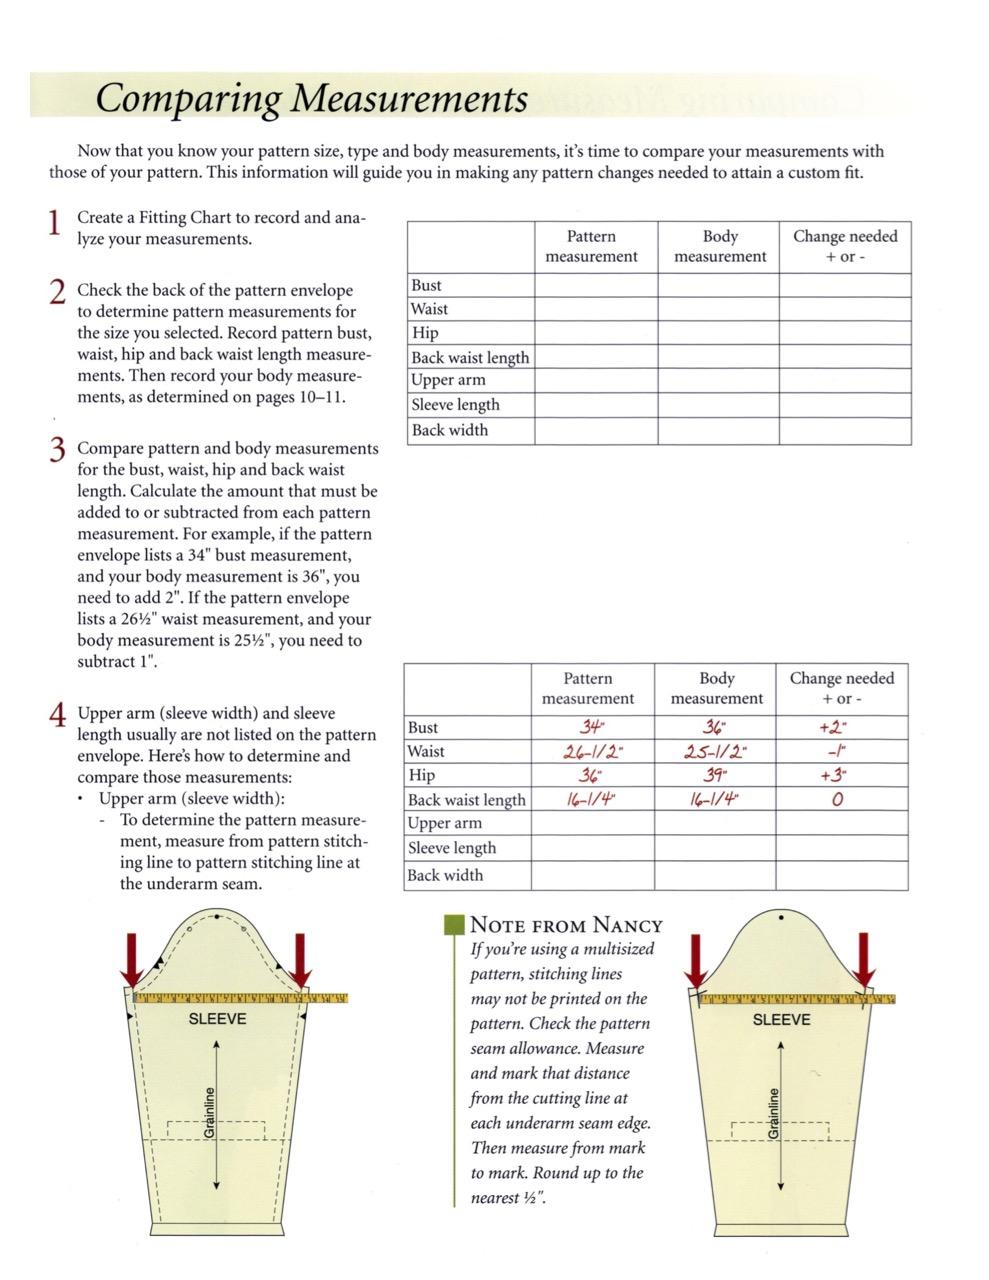 Pattern Fitting the Nancy Zieman Way Personal Fitting Chart